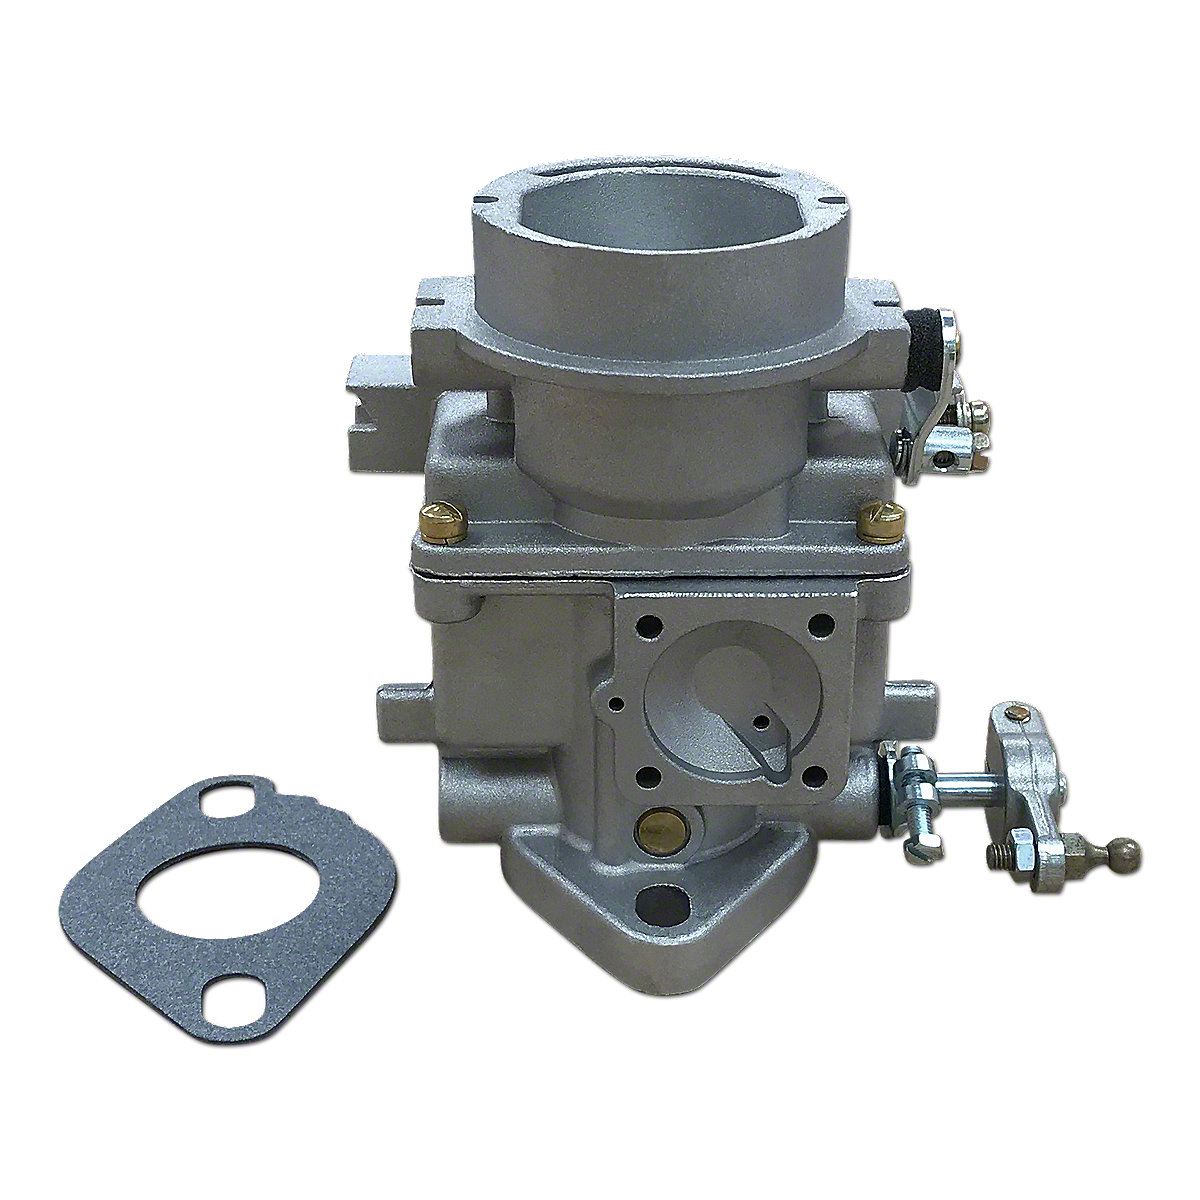 Carburetor For Tractor : R ihs ih b carburetor